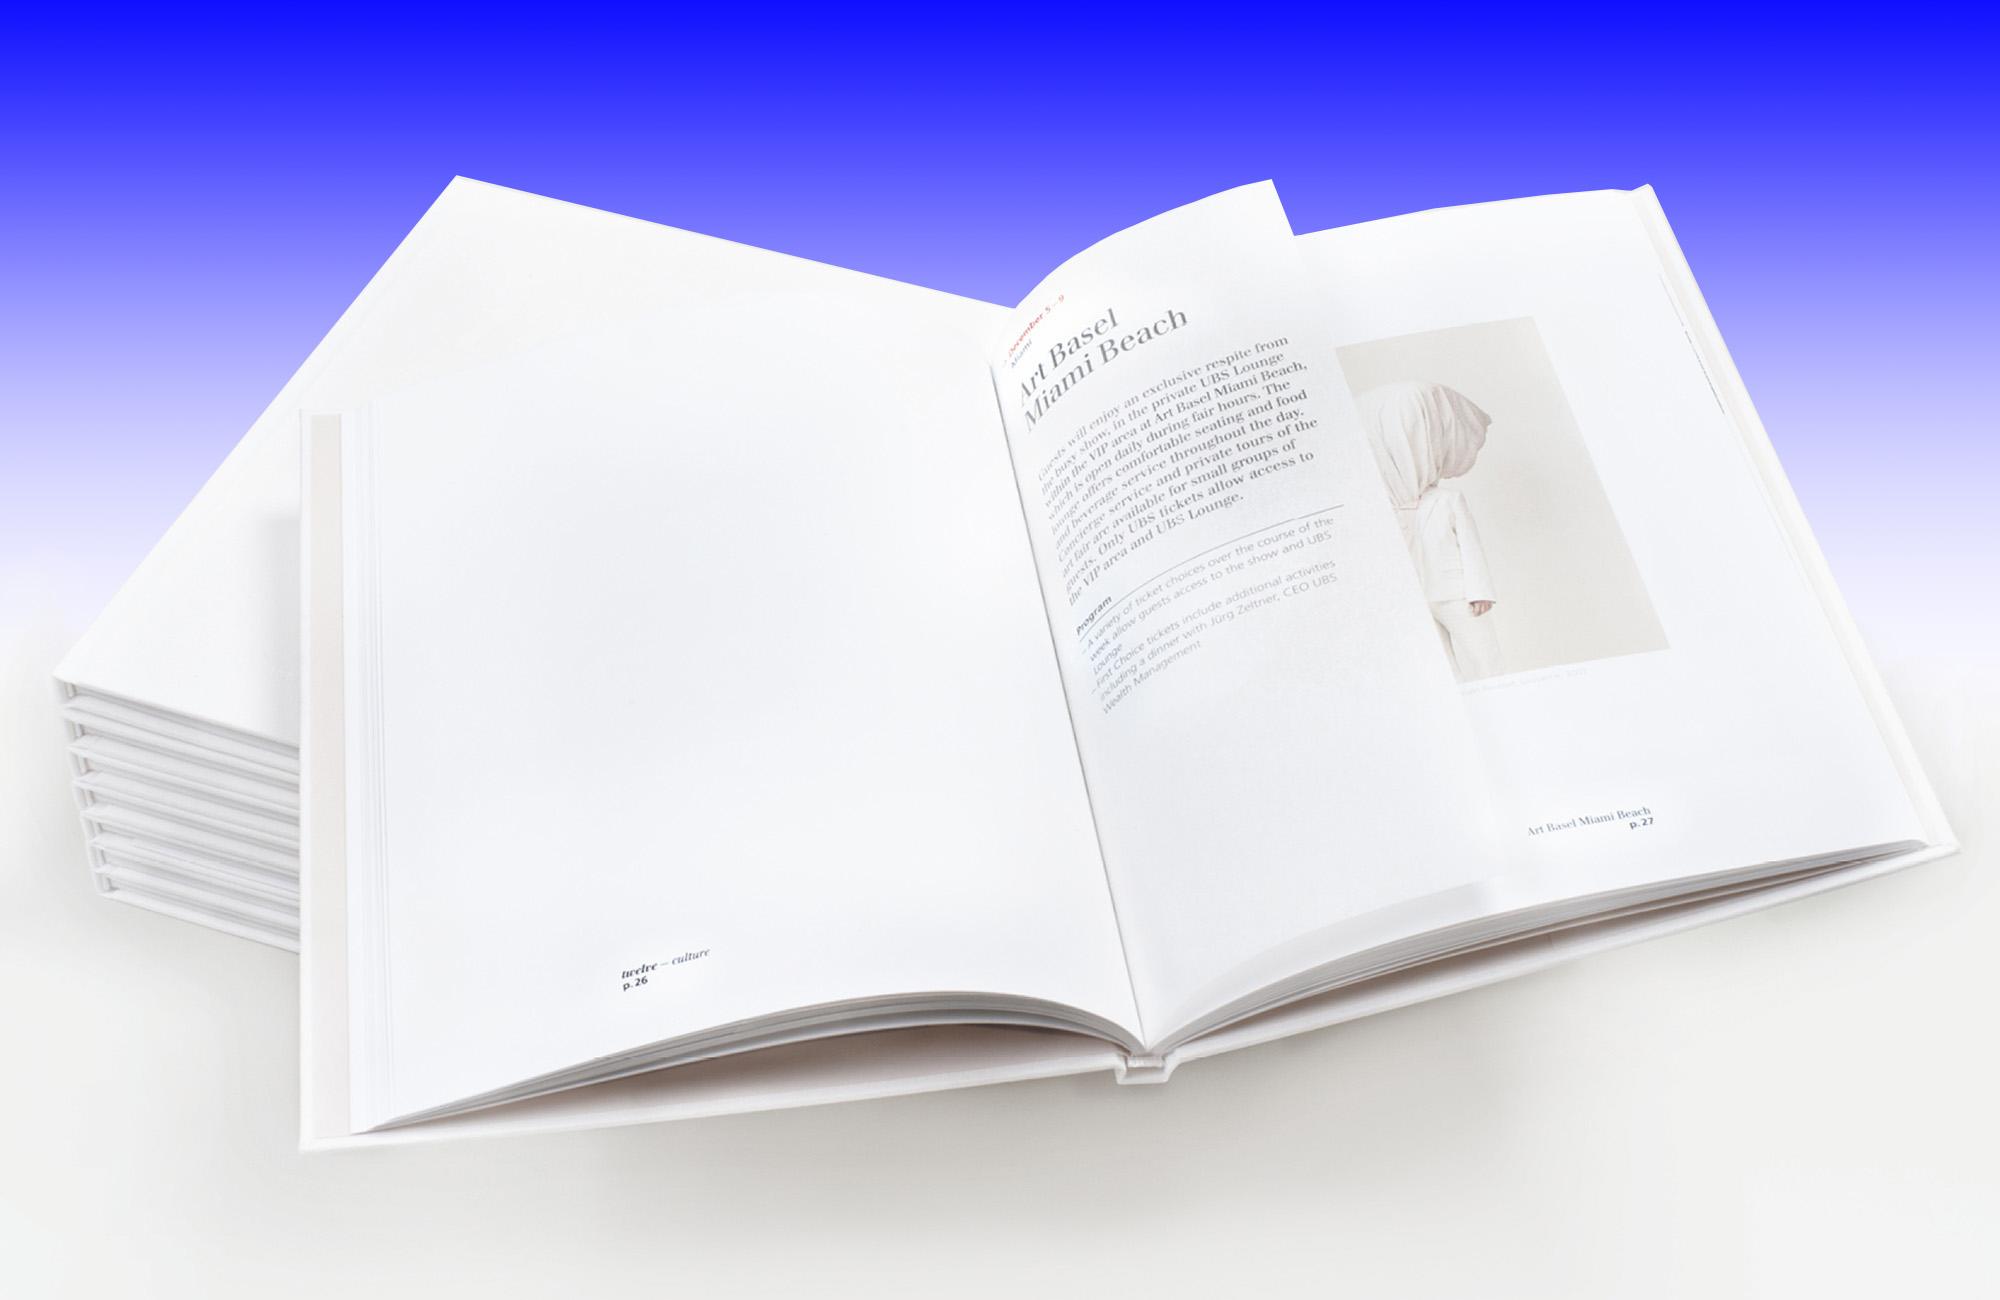 Simone Züger: UBS / Art Basel / ZHdK